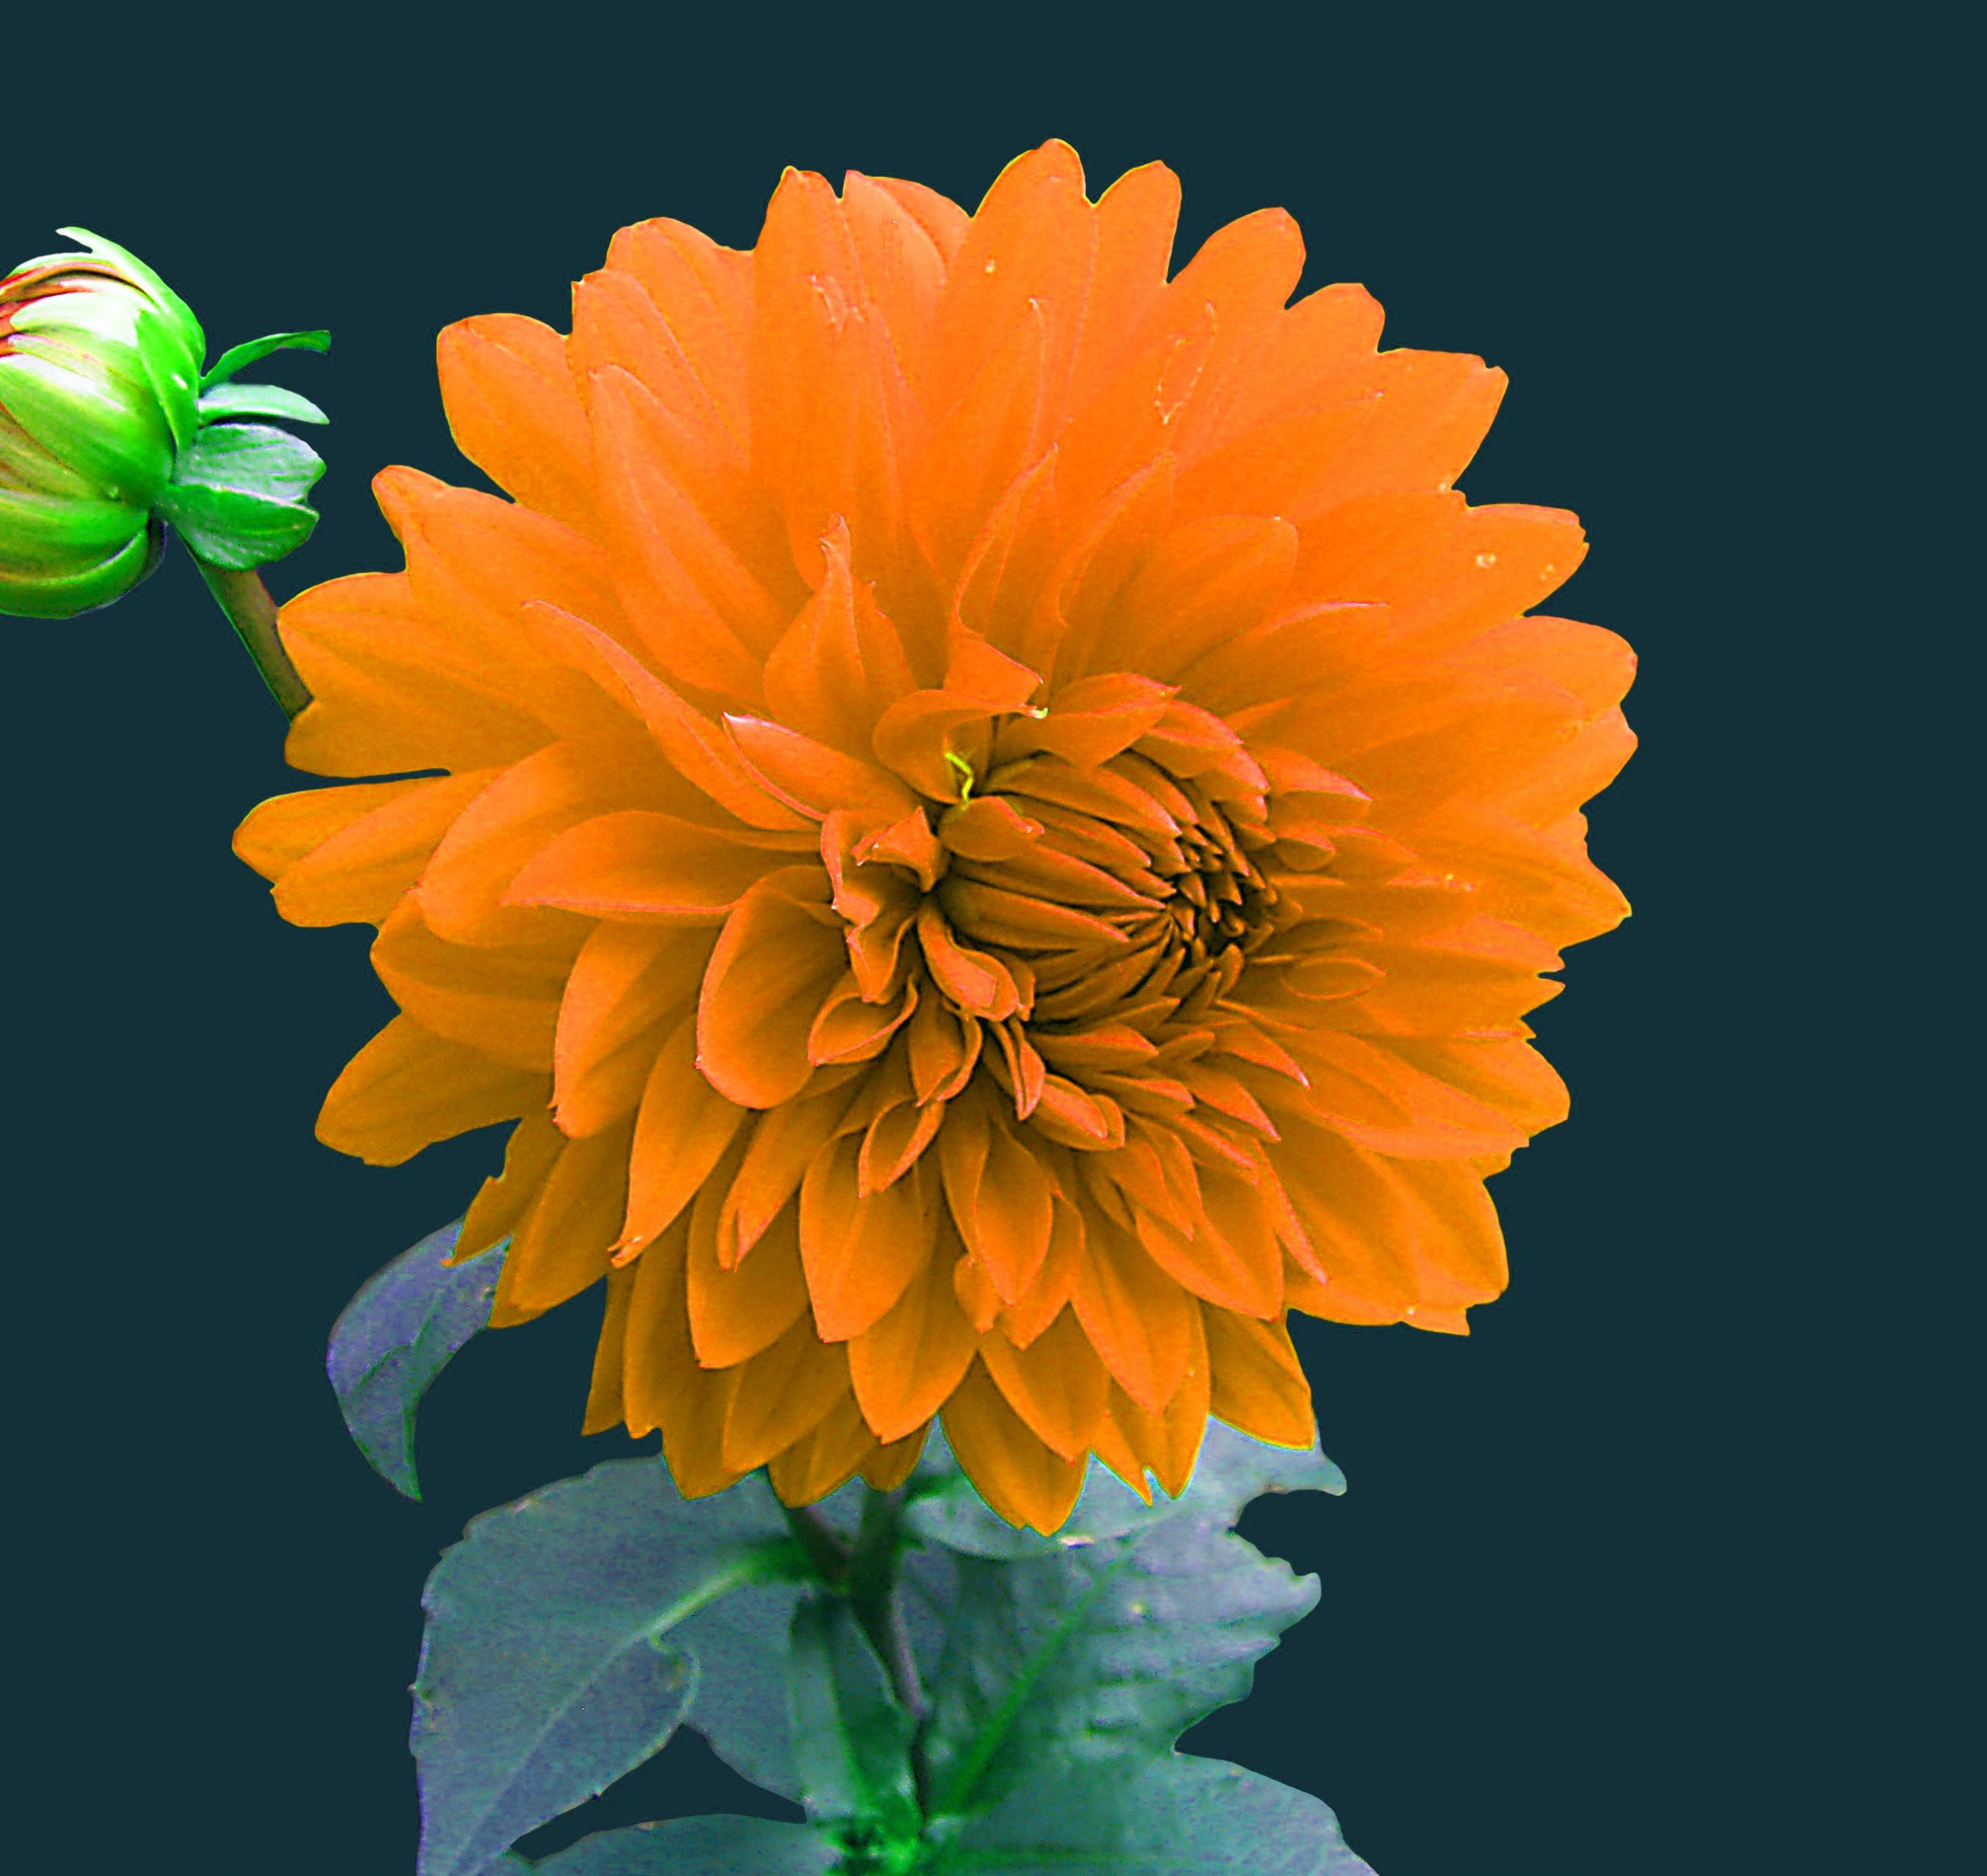 Best Quality Flower DP Images